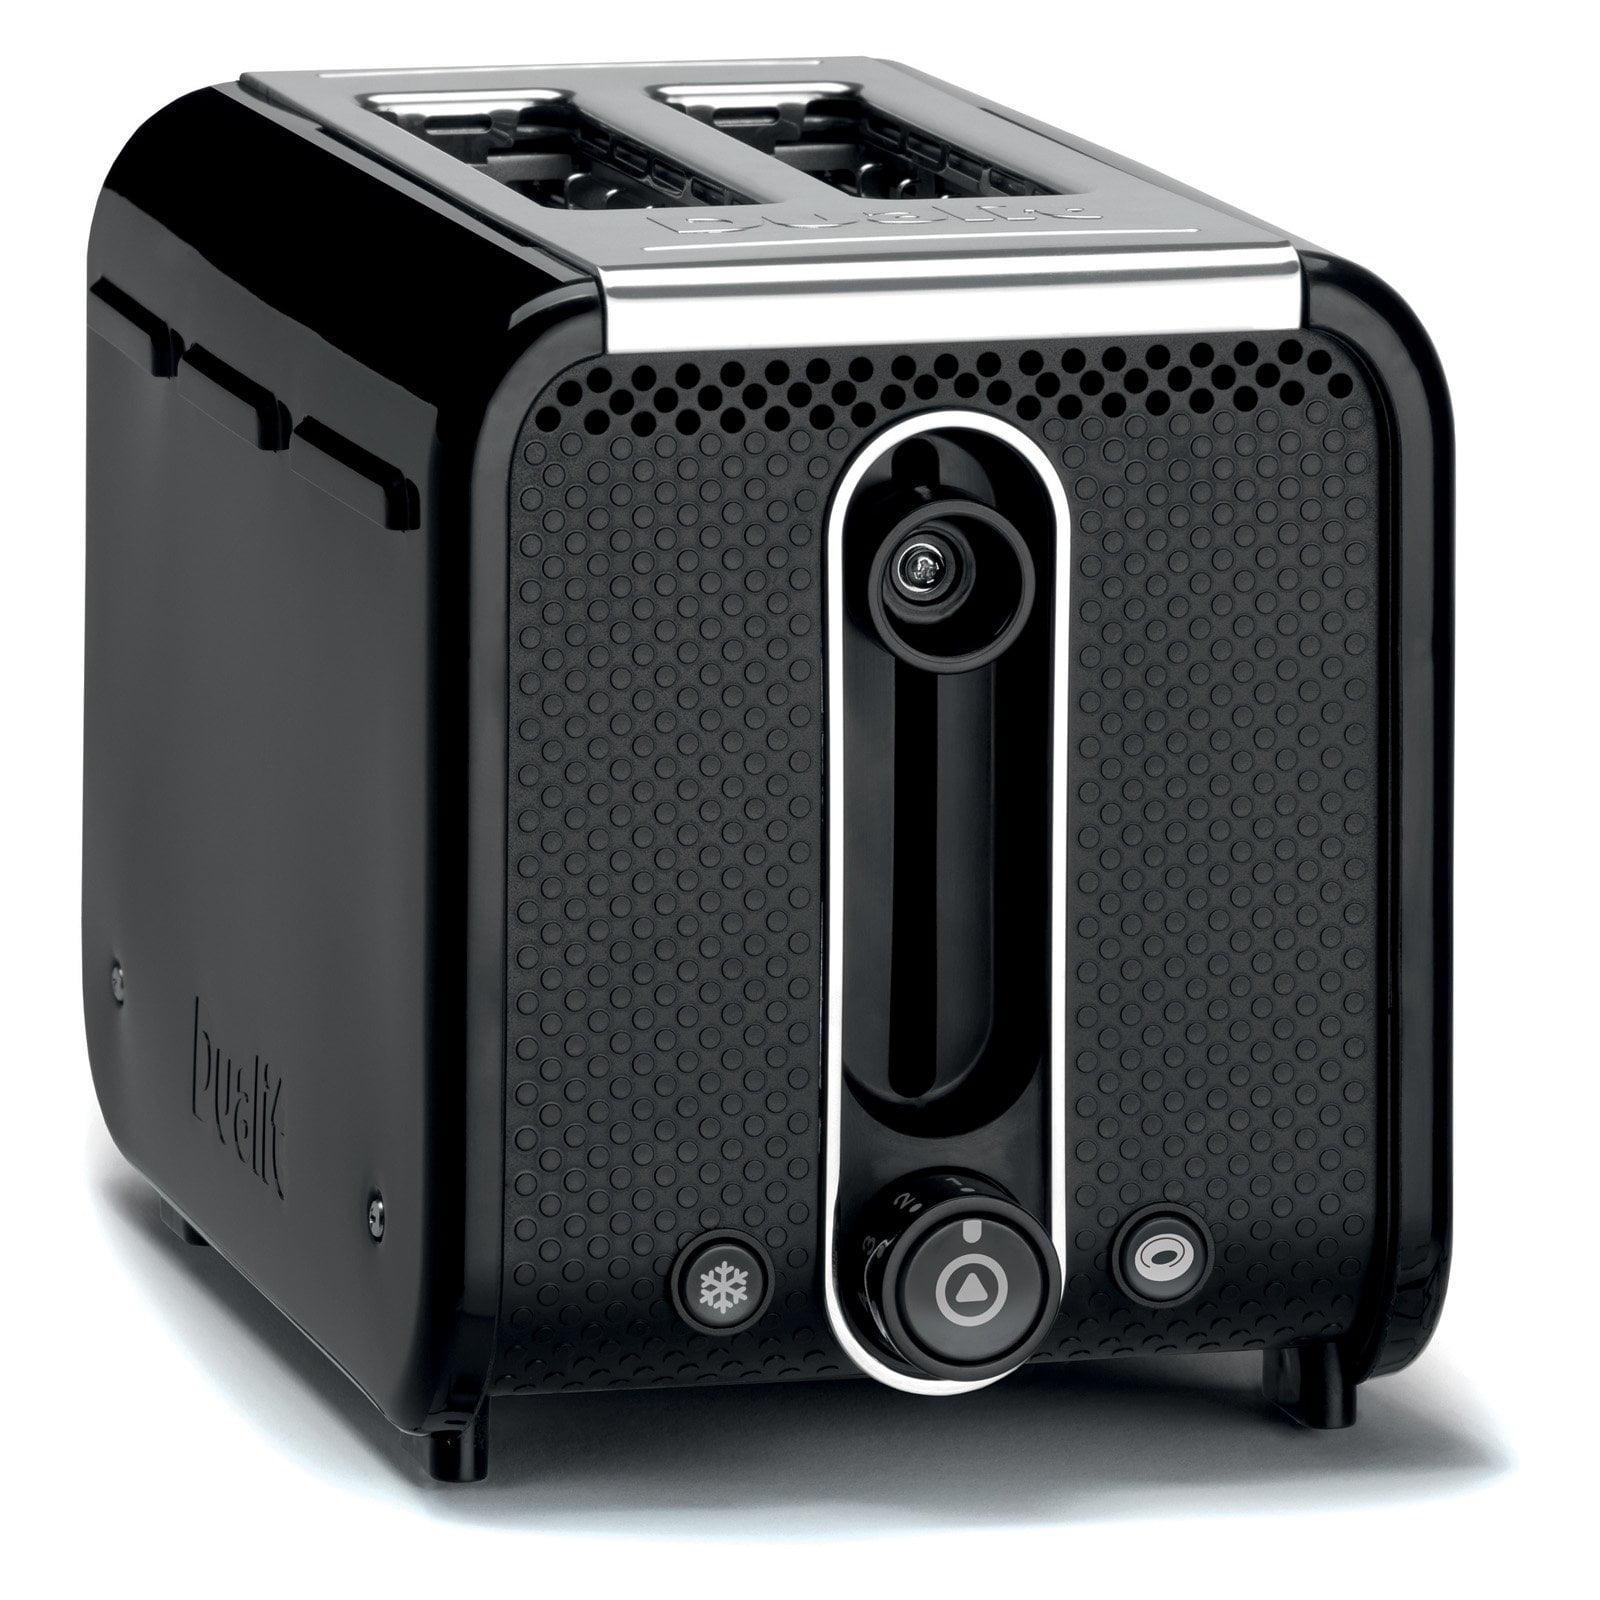 Dualit 26430 2 Slice Toaster - Black/Polished